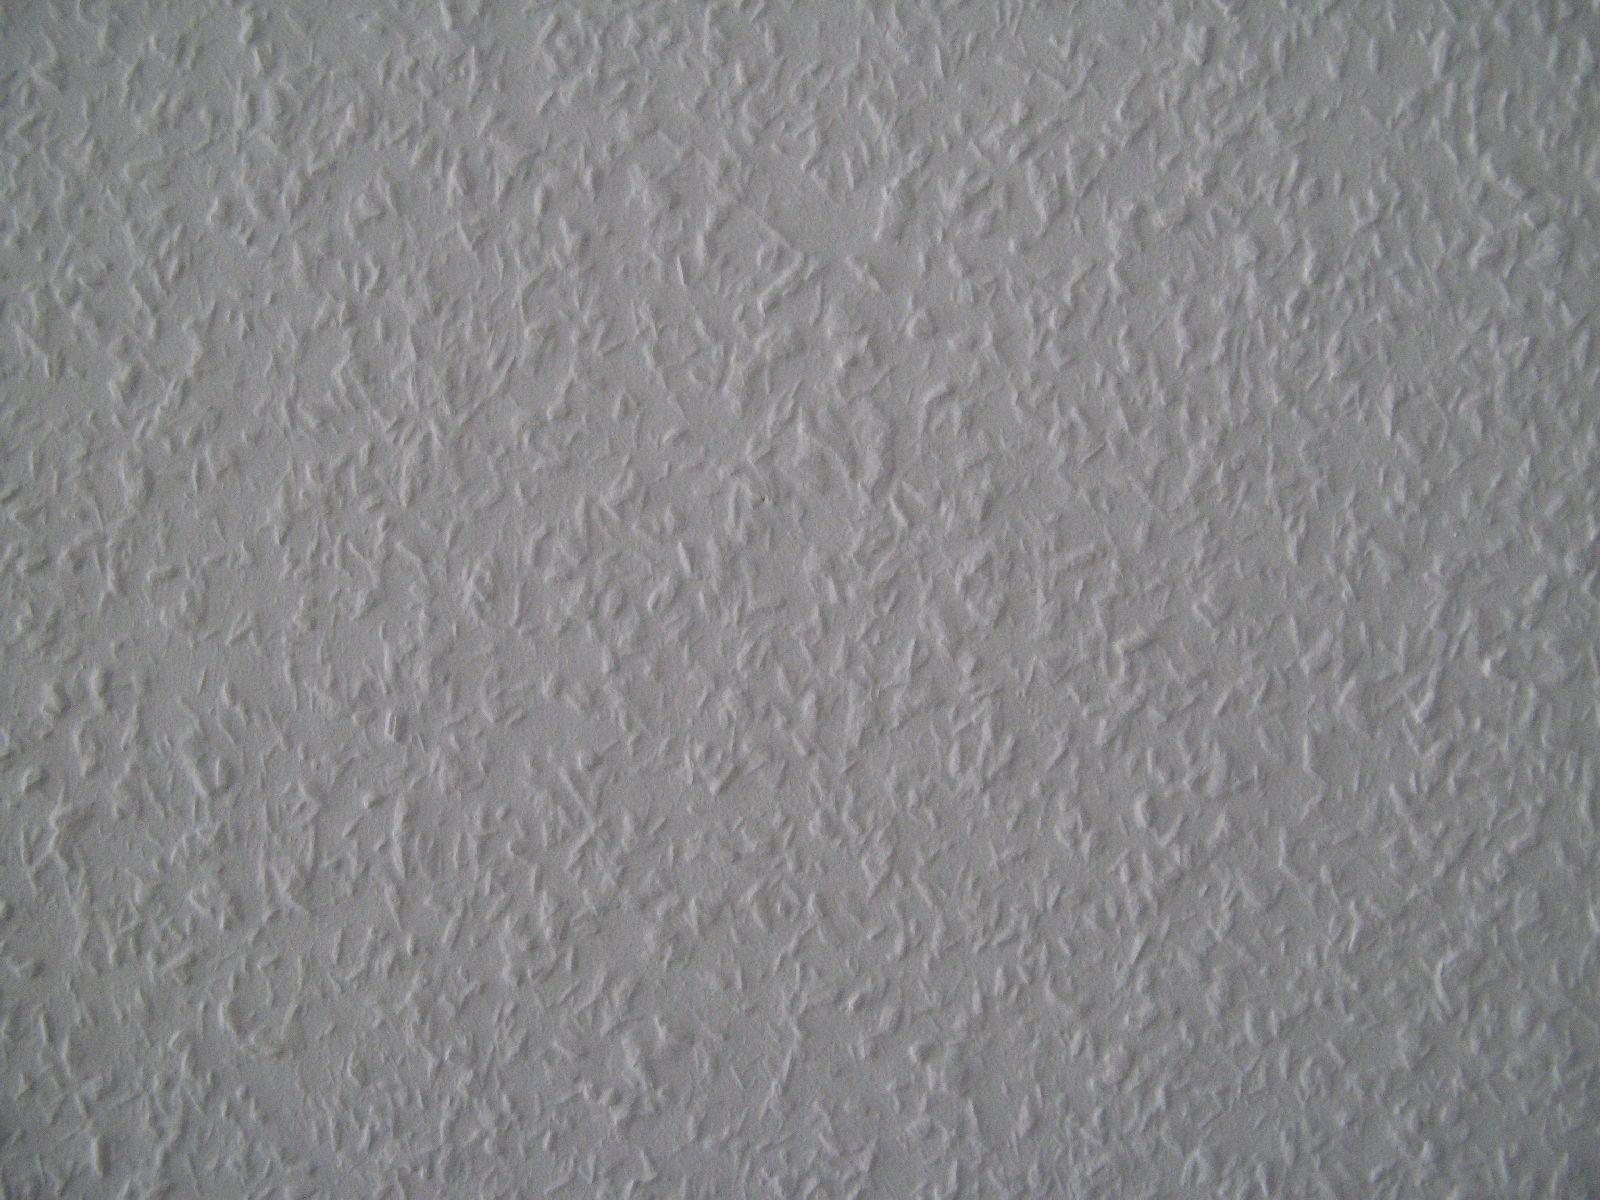 Innenraum-Material_Textur_B_5724